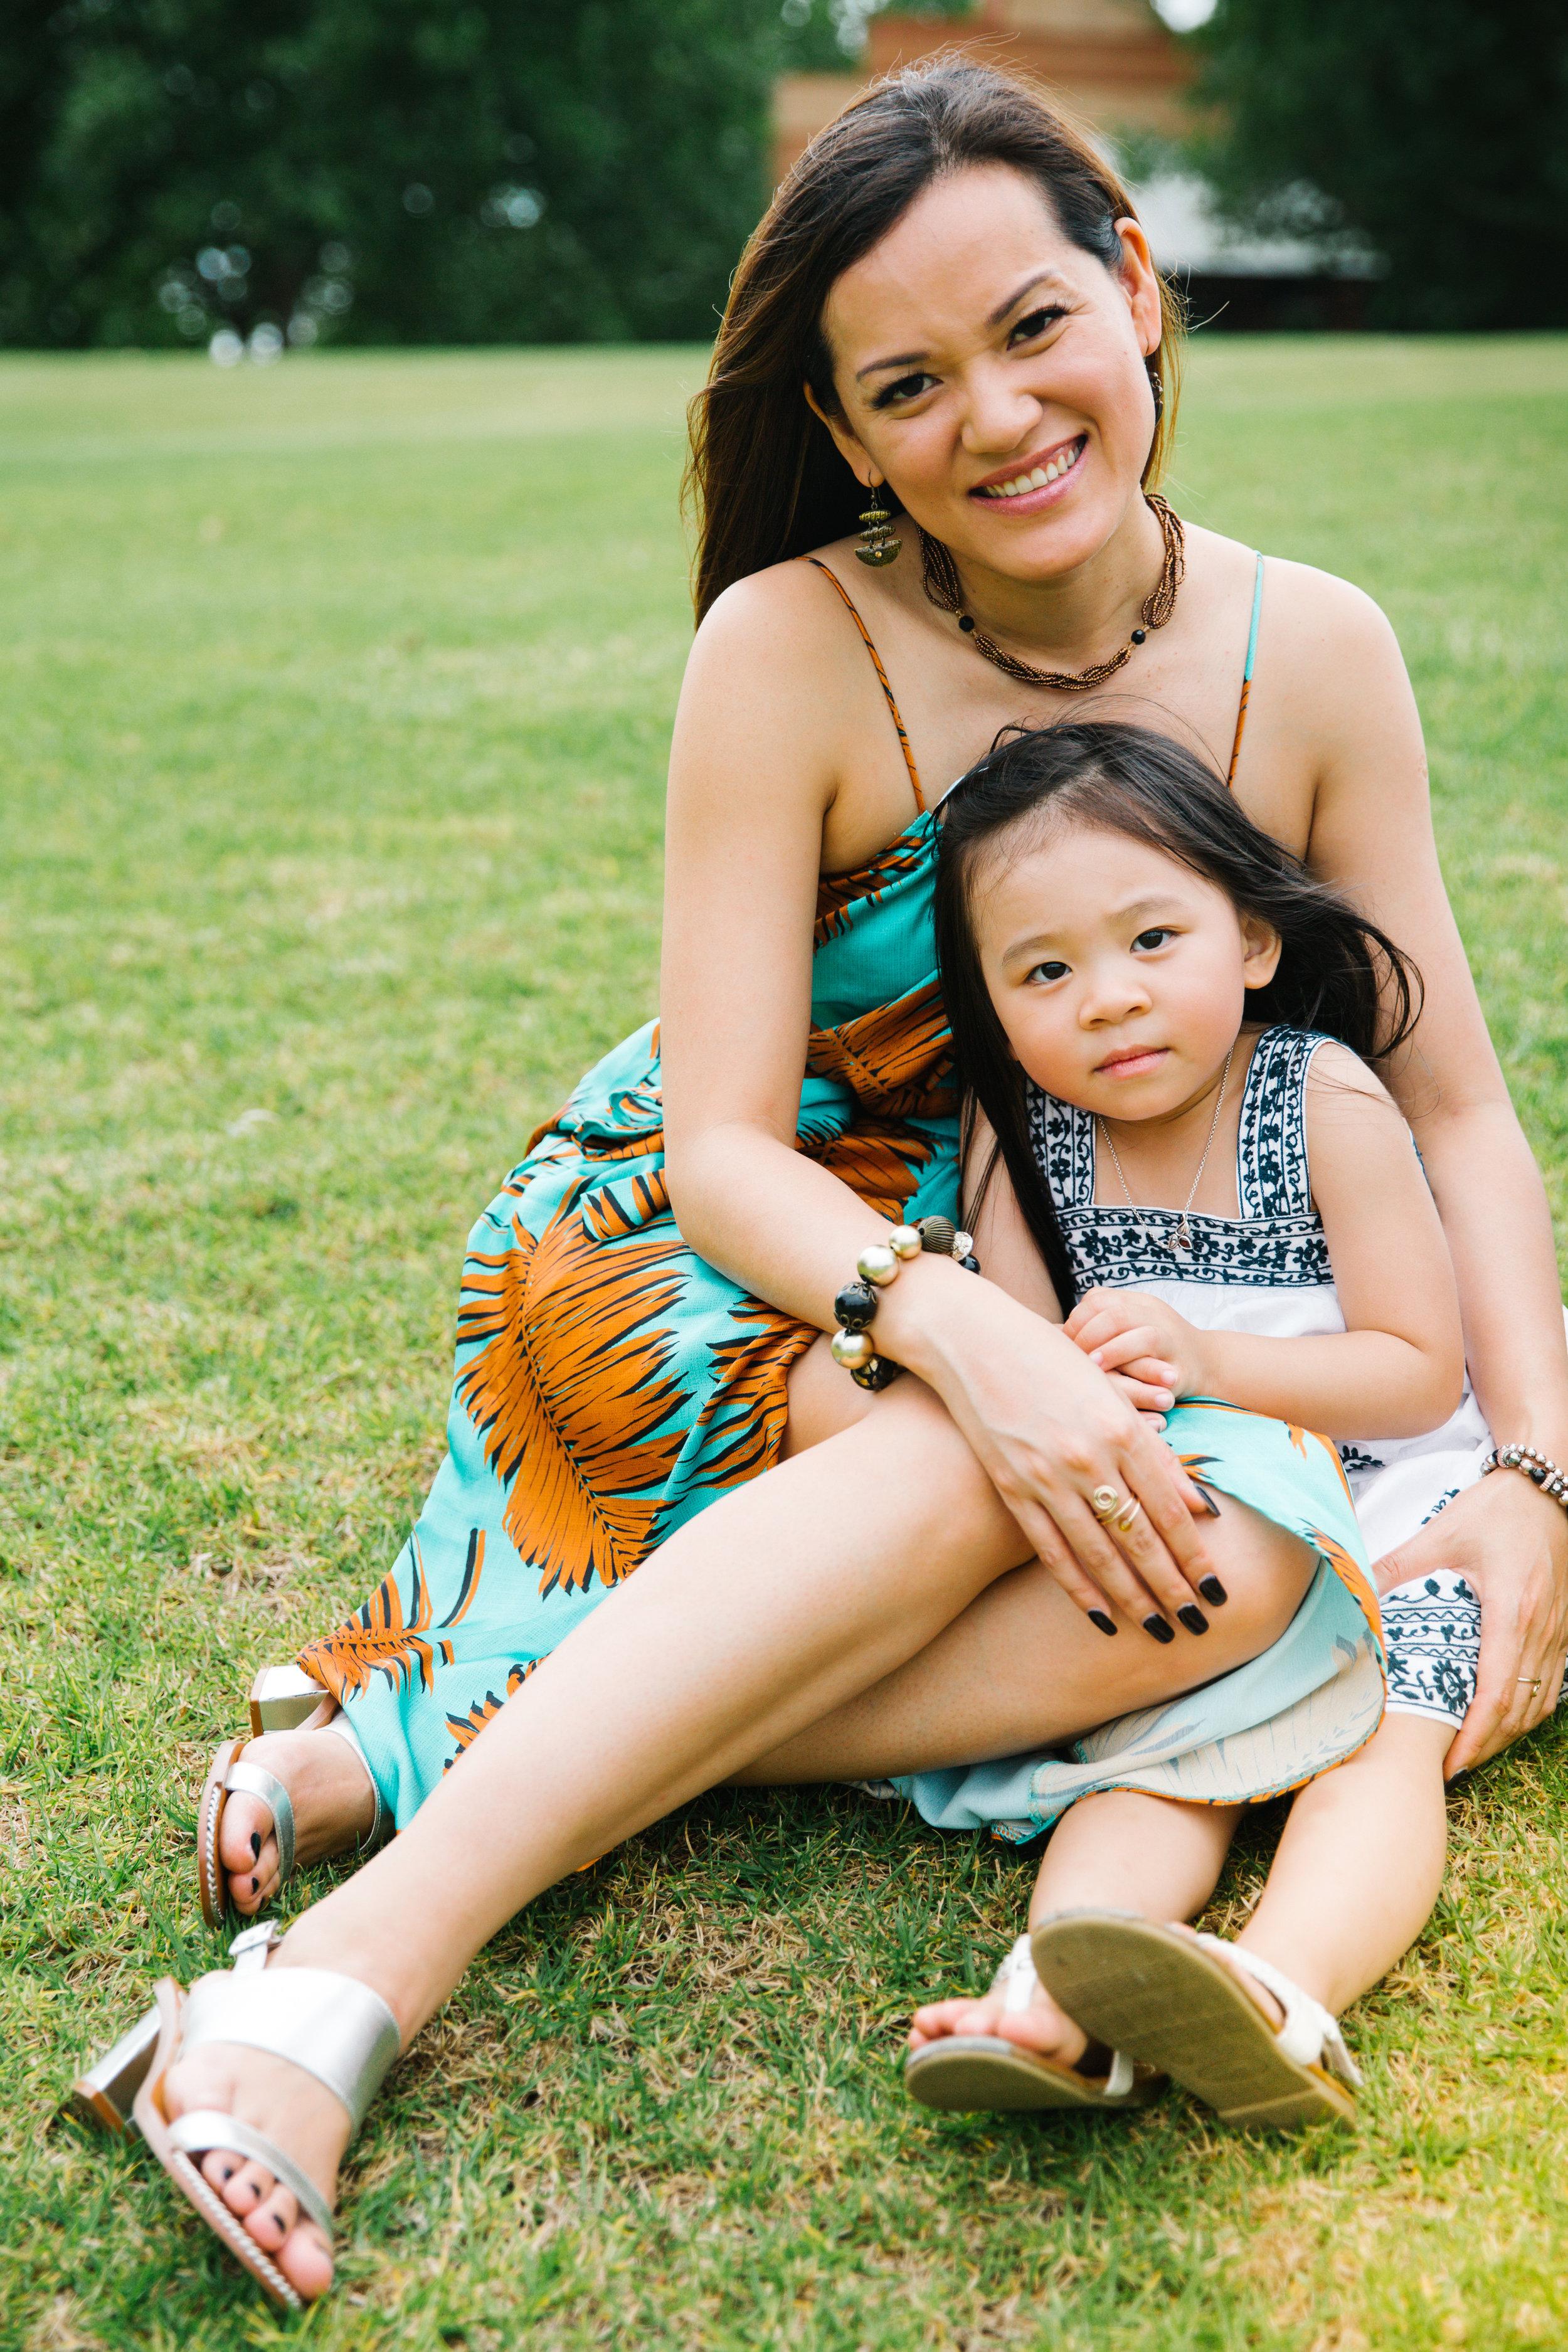 mother & daughter outdoor photo shoot